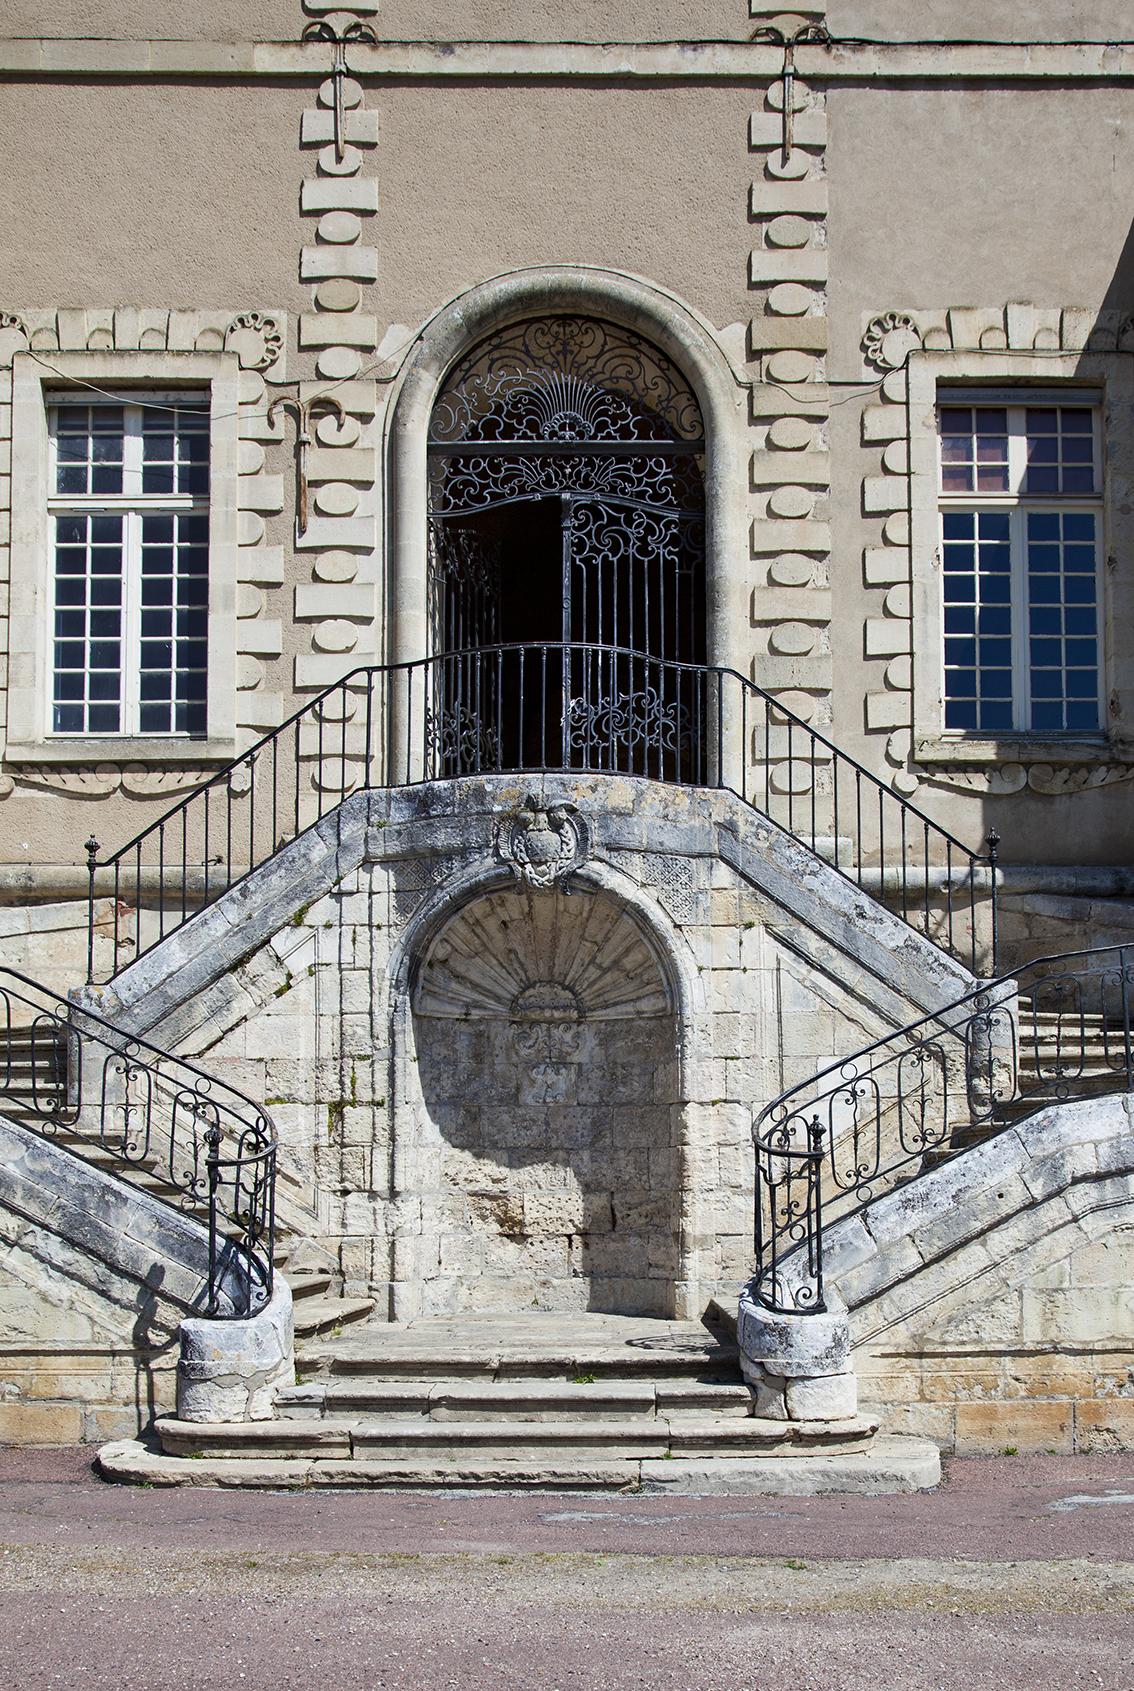 La-Reole-grille-Blaise-Charlut-IMG_8445